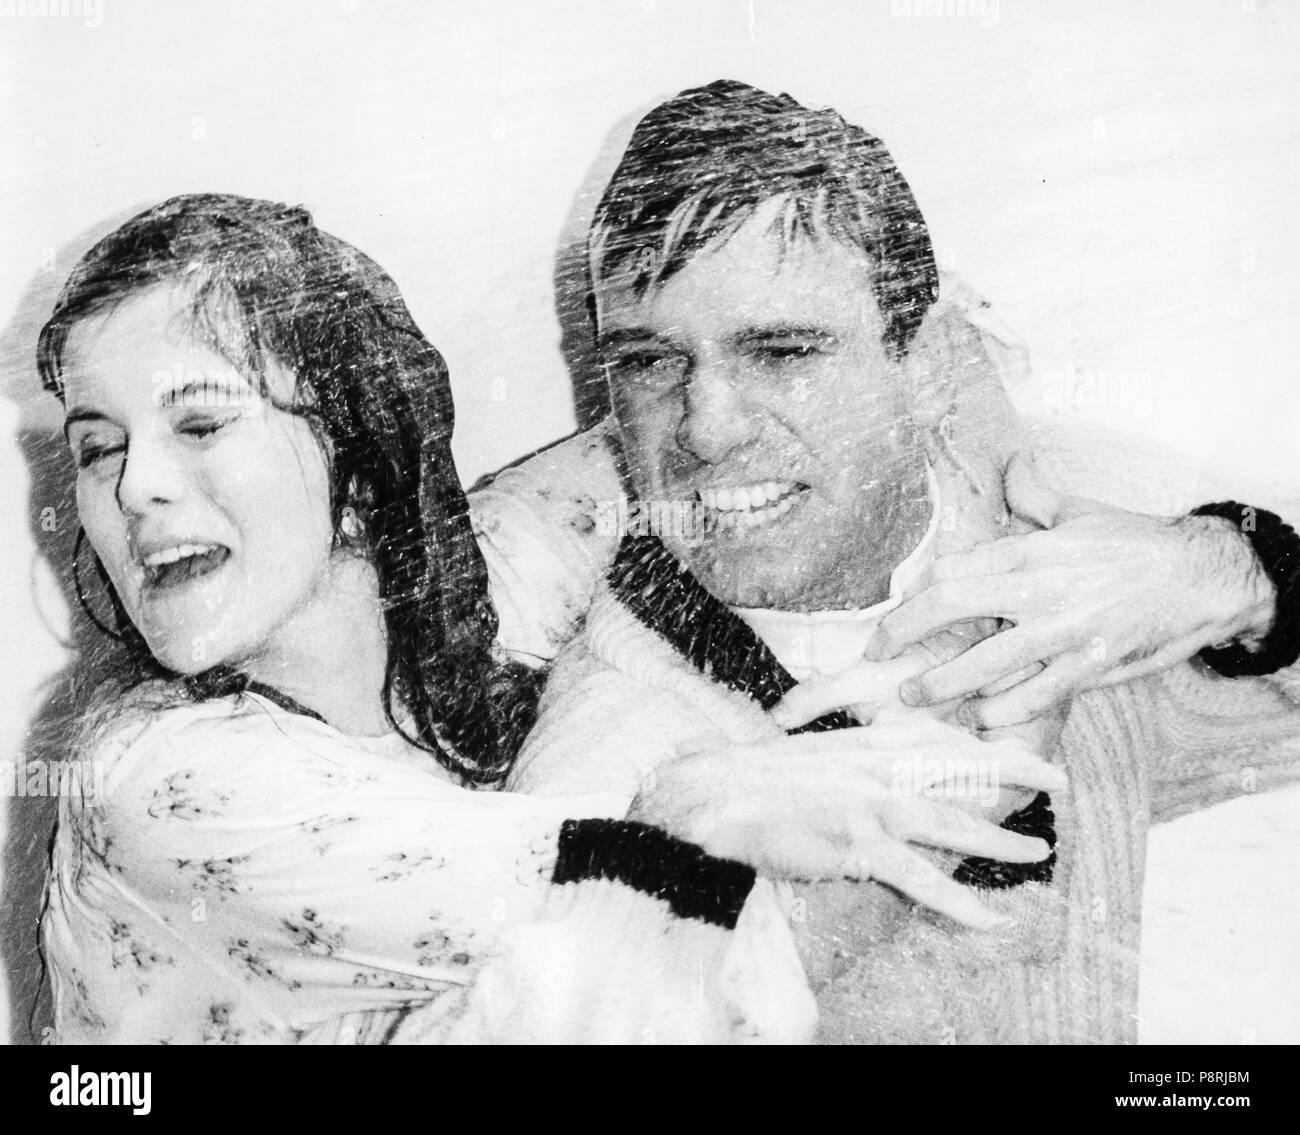 ann margret, anthony franciosa, the swinger, 1966 - Stock Image